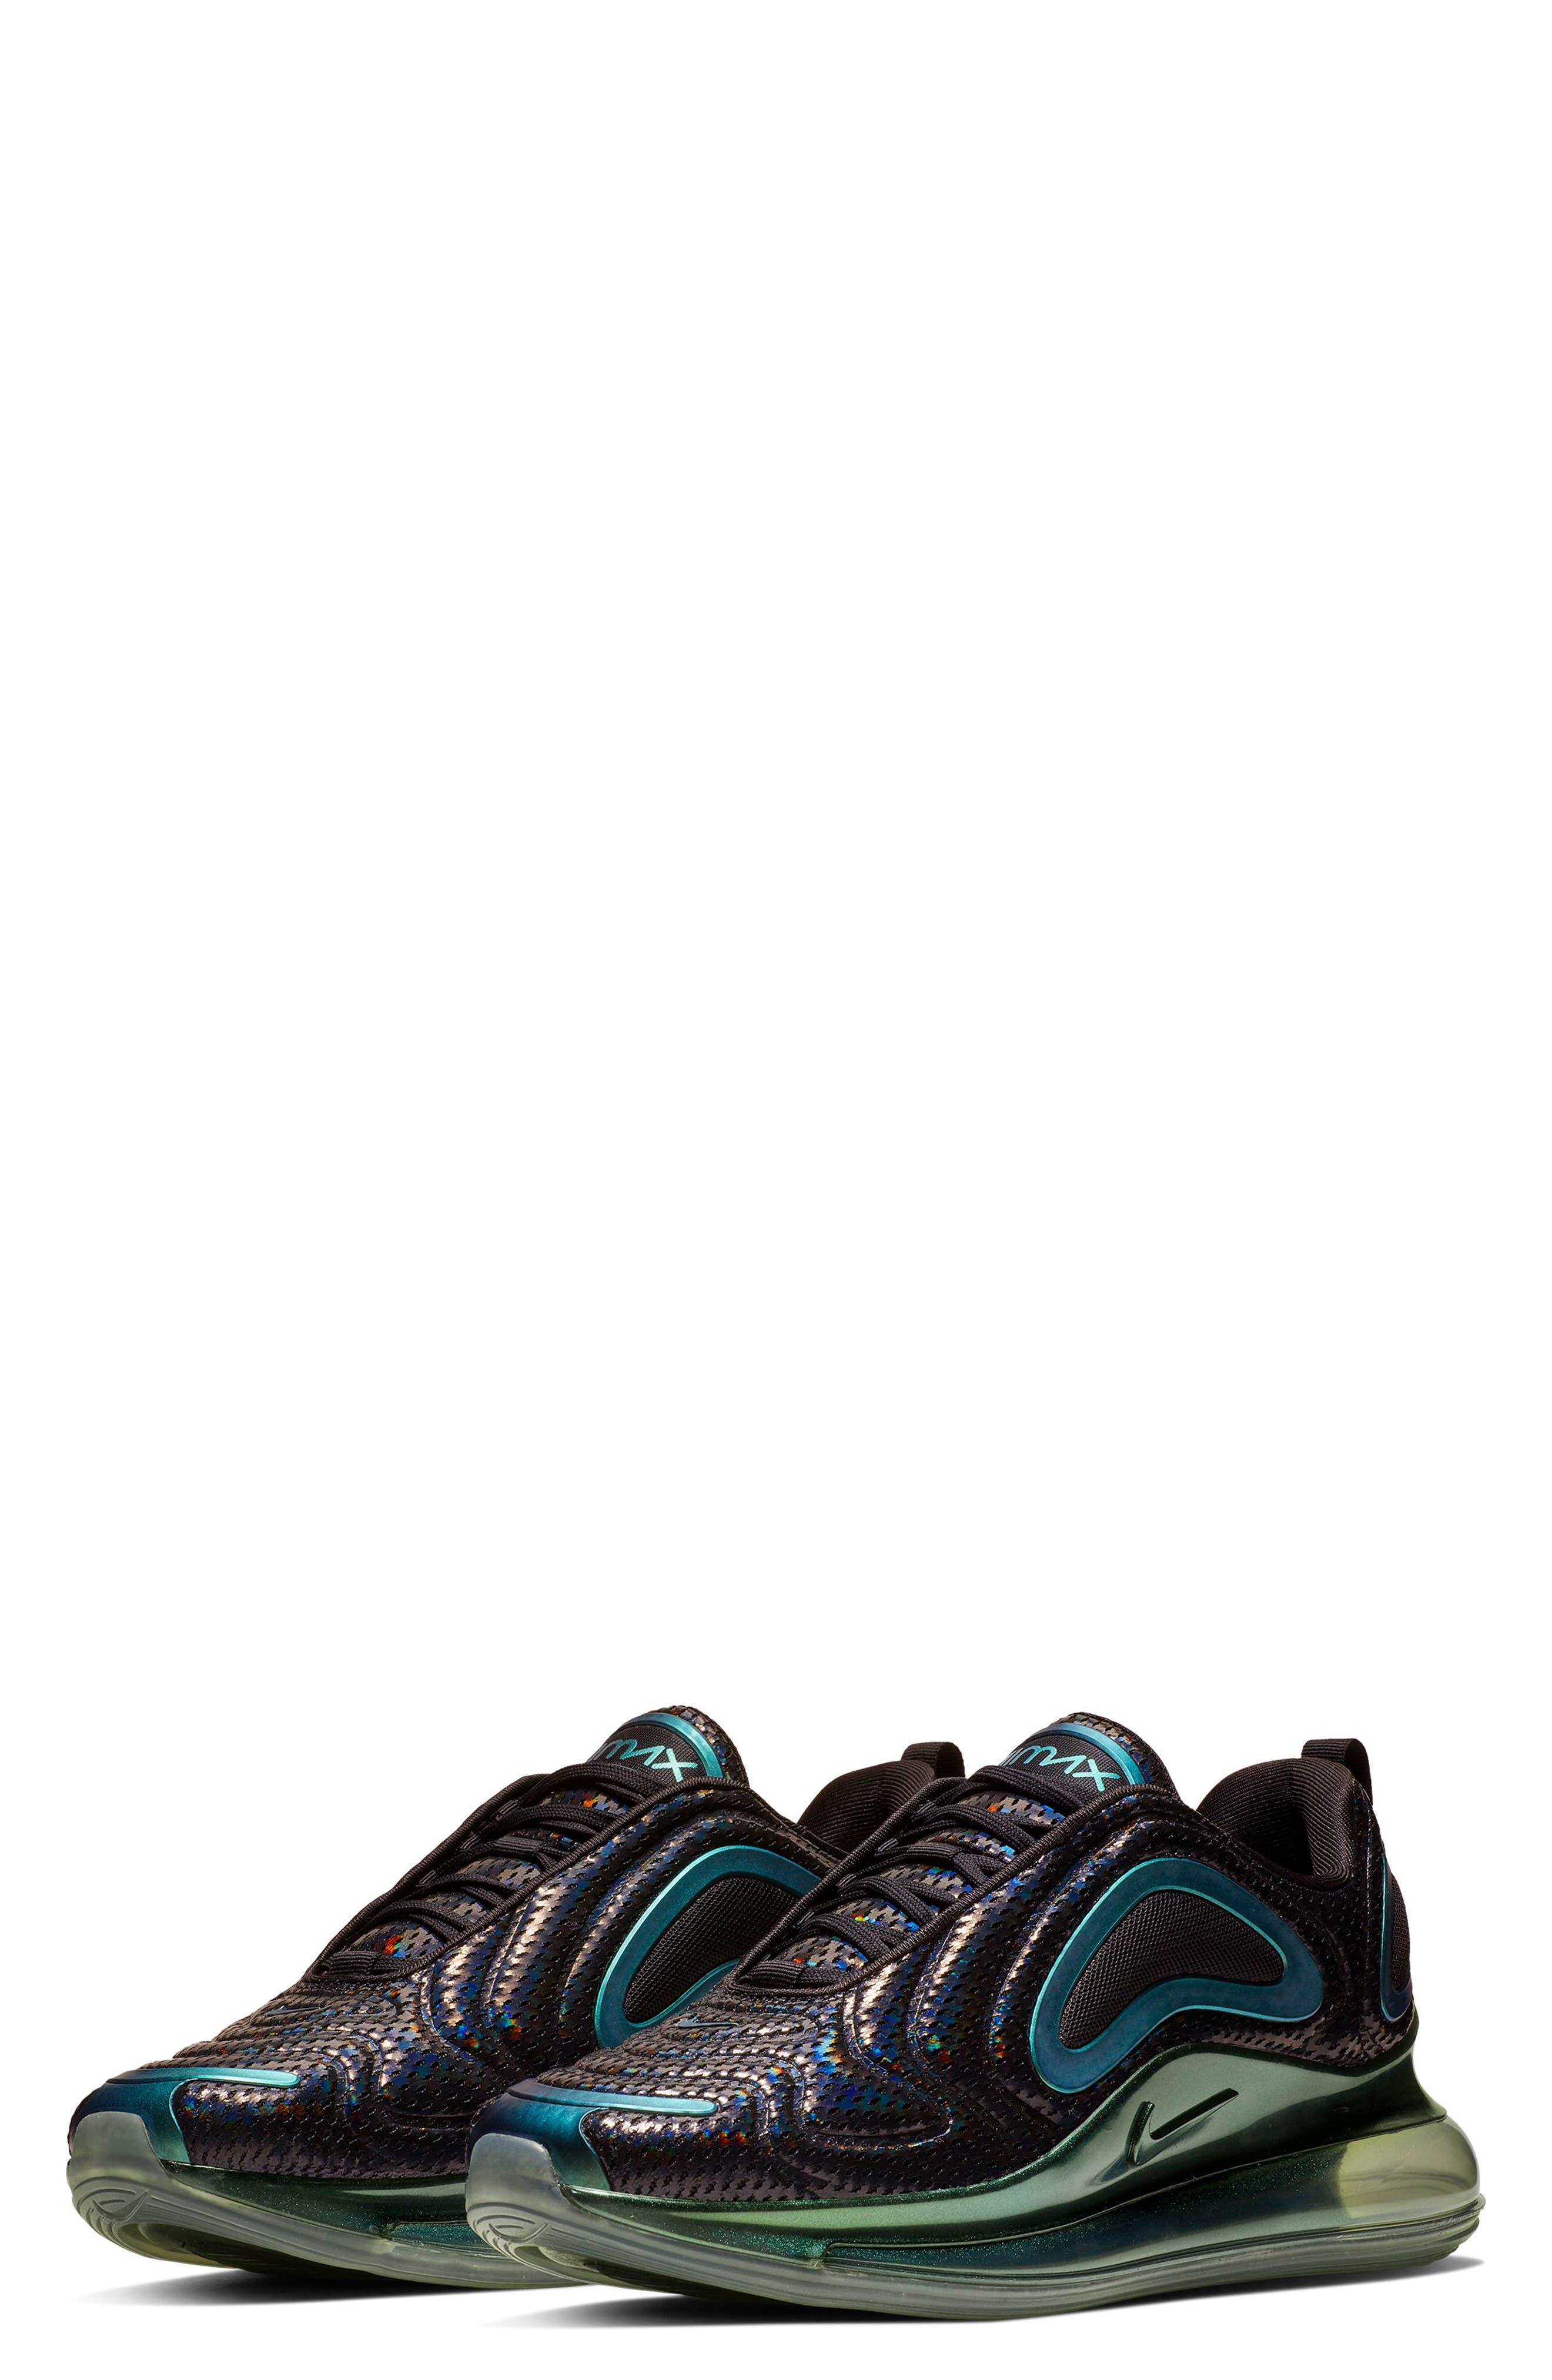 NIKE, Air Max 720 Sneaker, Main thumbnail 1, color, BLACK/ FUCHSIA/ ANTHRACITE